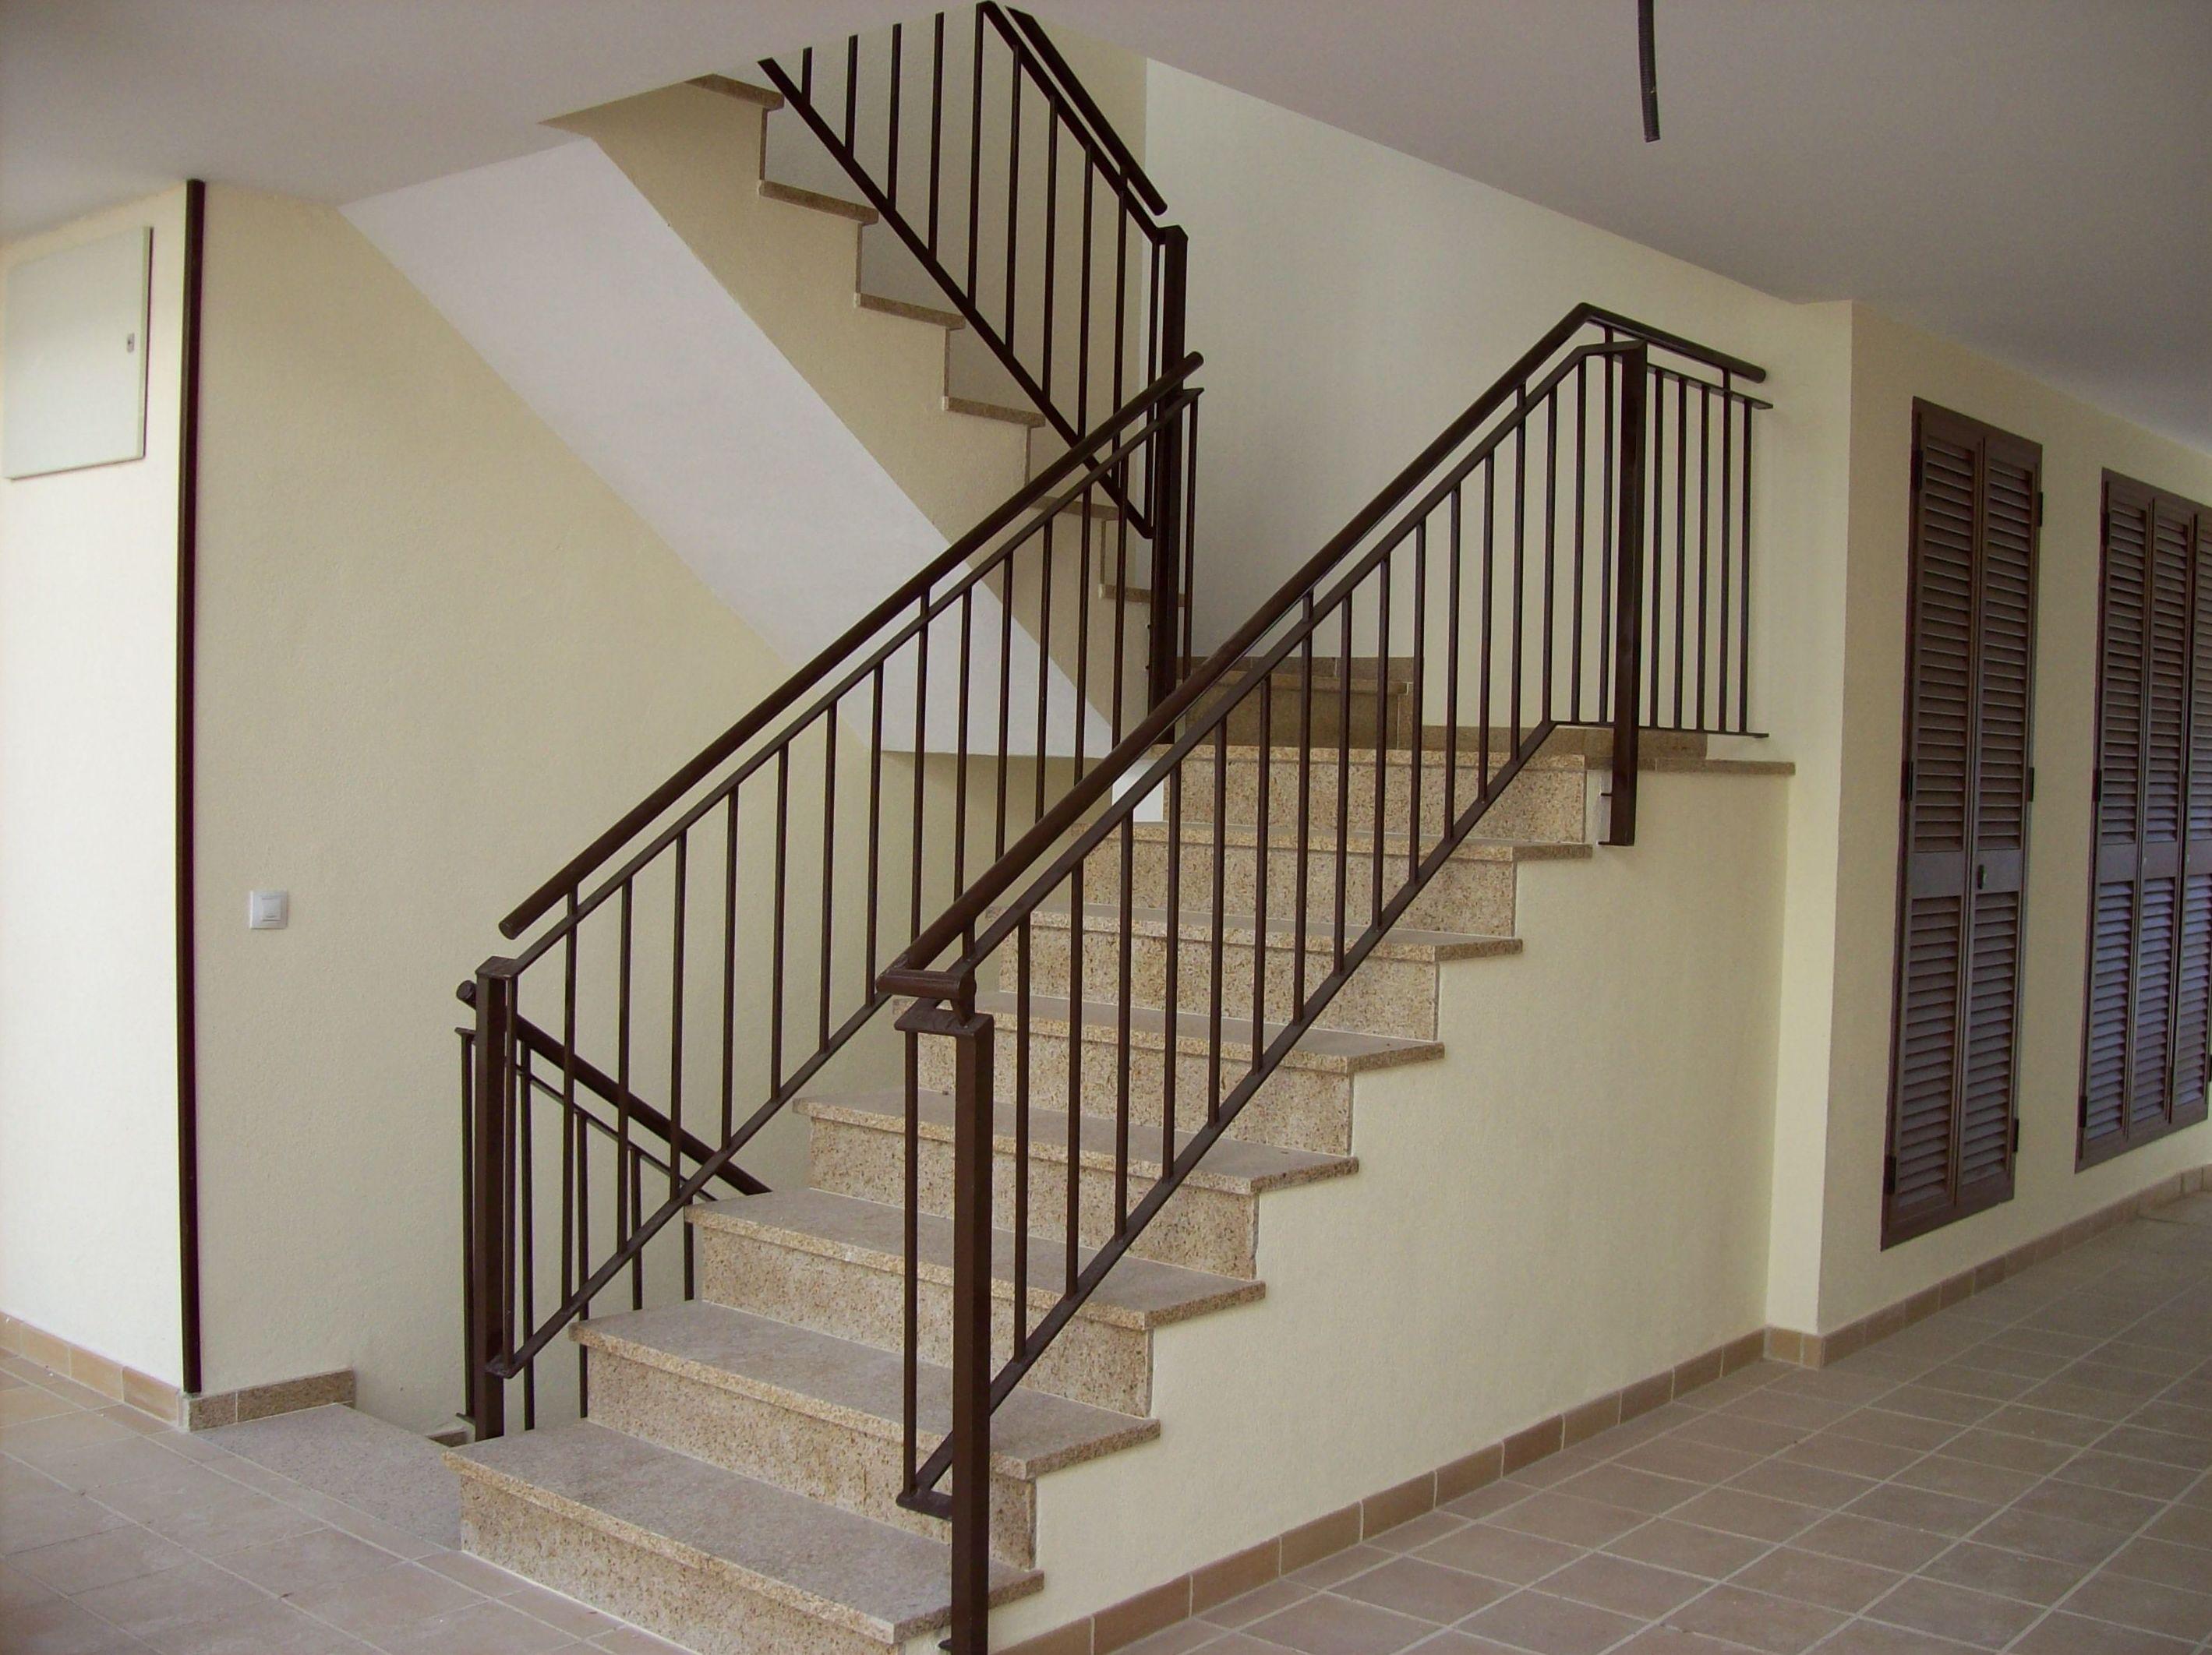 Barandas para escaleras modernas latest catlogo de for Barandas de escalera